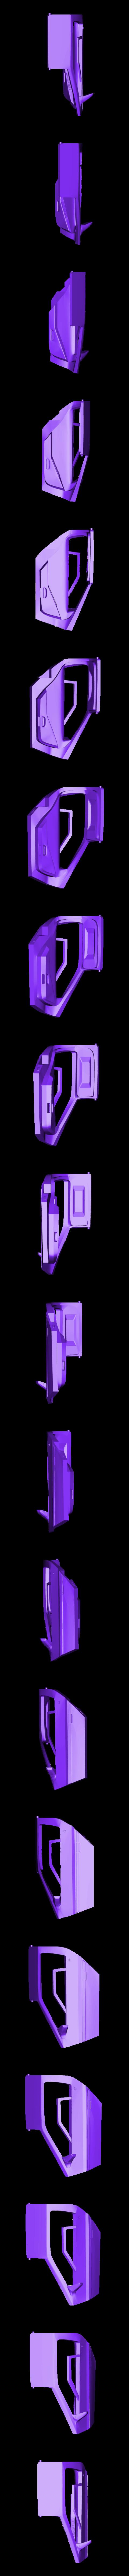 door_left.stl Download free STL file DIY DeLorean Time Machine with lights!! • 3D printer model, OneIdMONstr